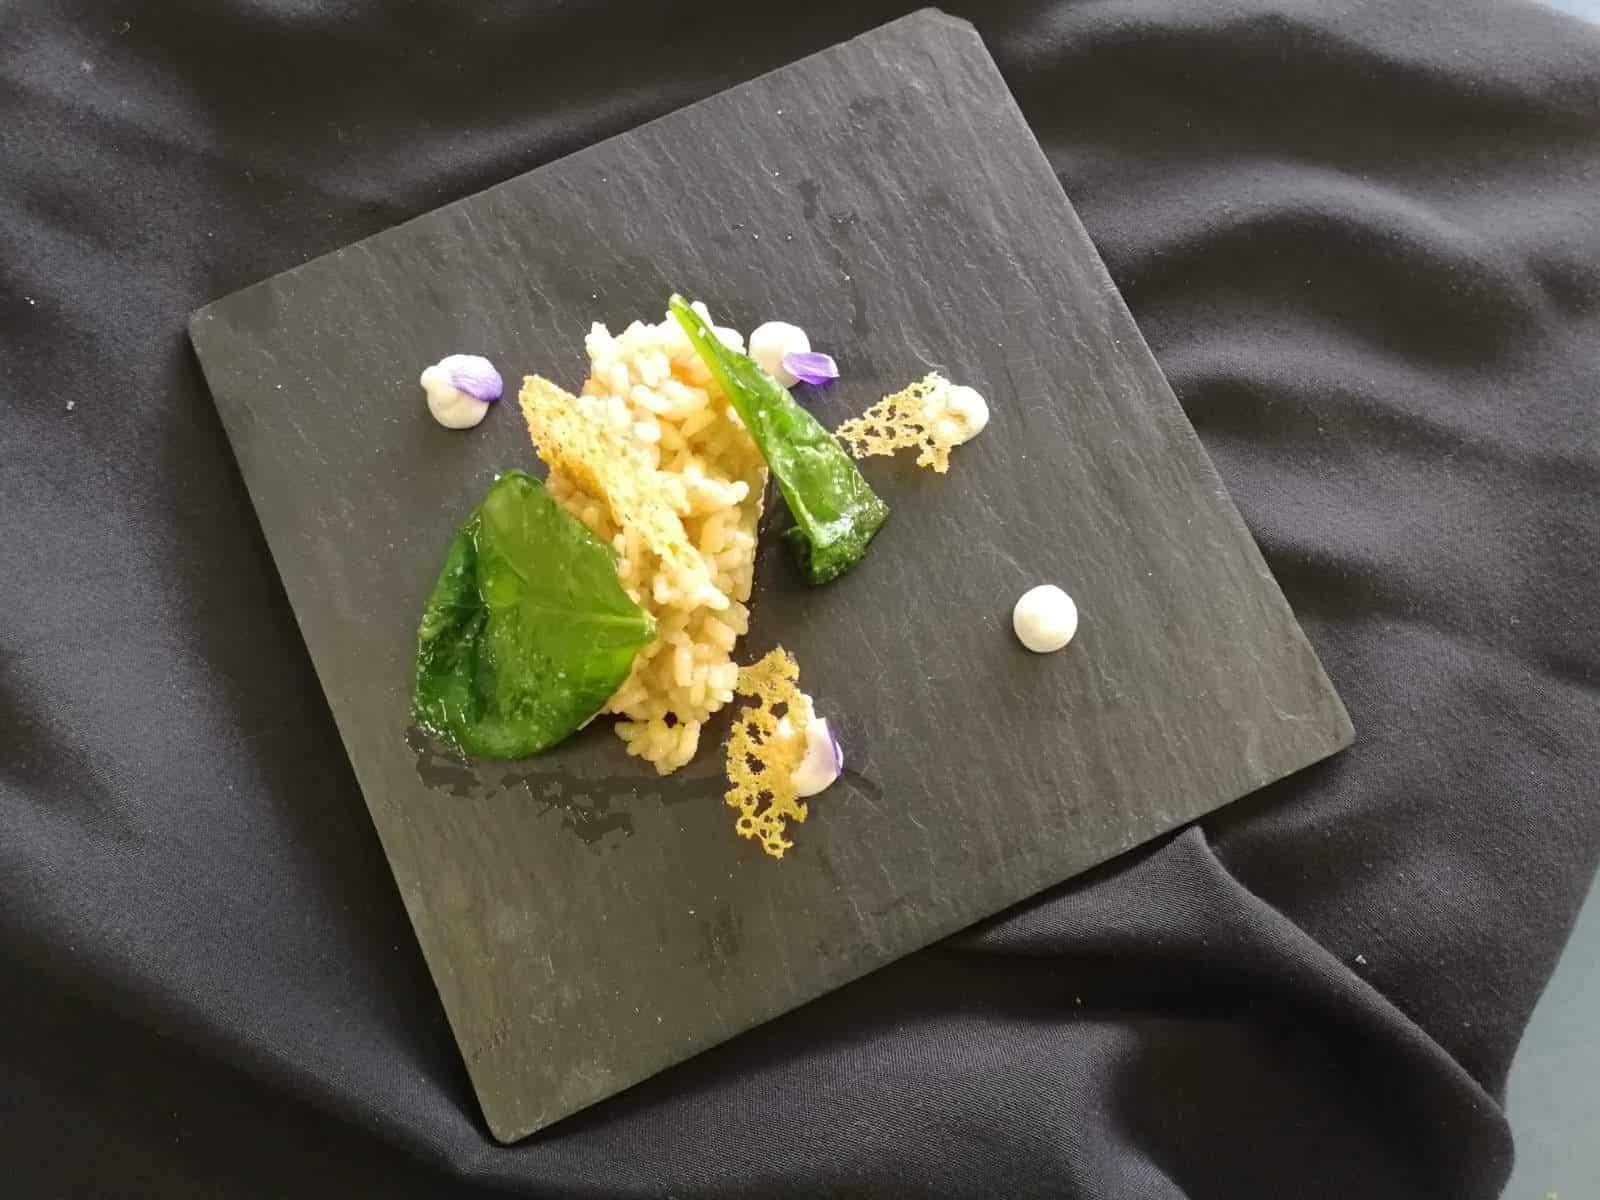 escuela-cocina-villa-retiro-cursos-chef-marianzo-gonzalvo-estrella-michelin